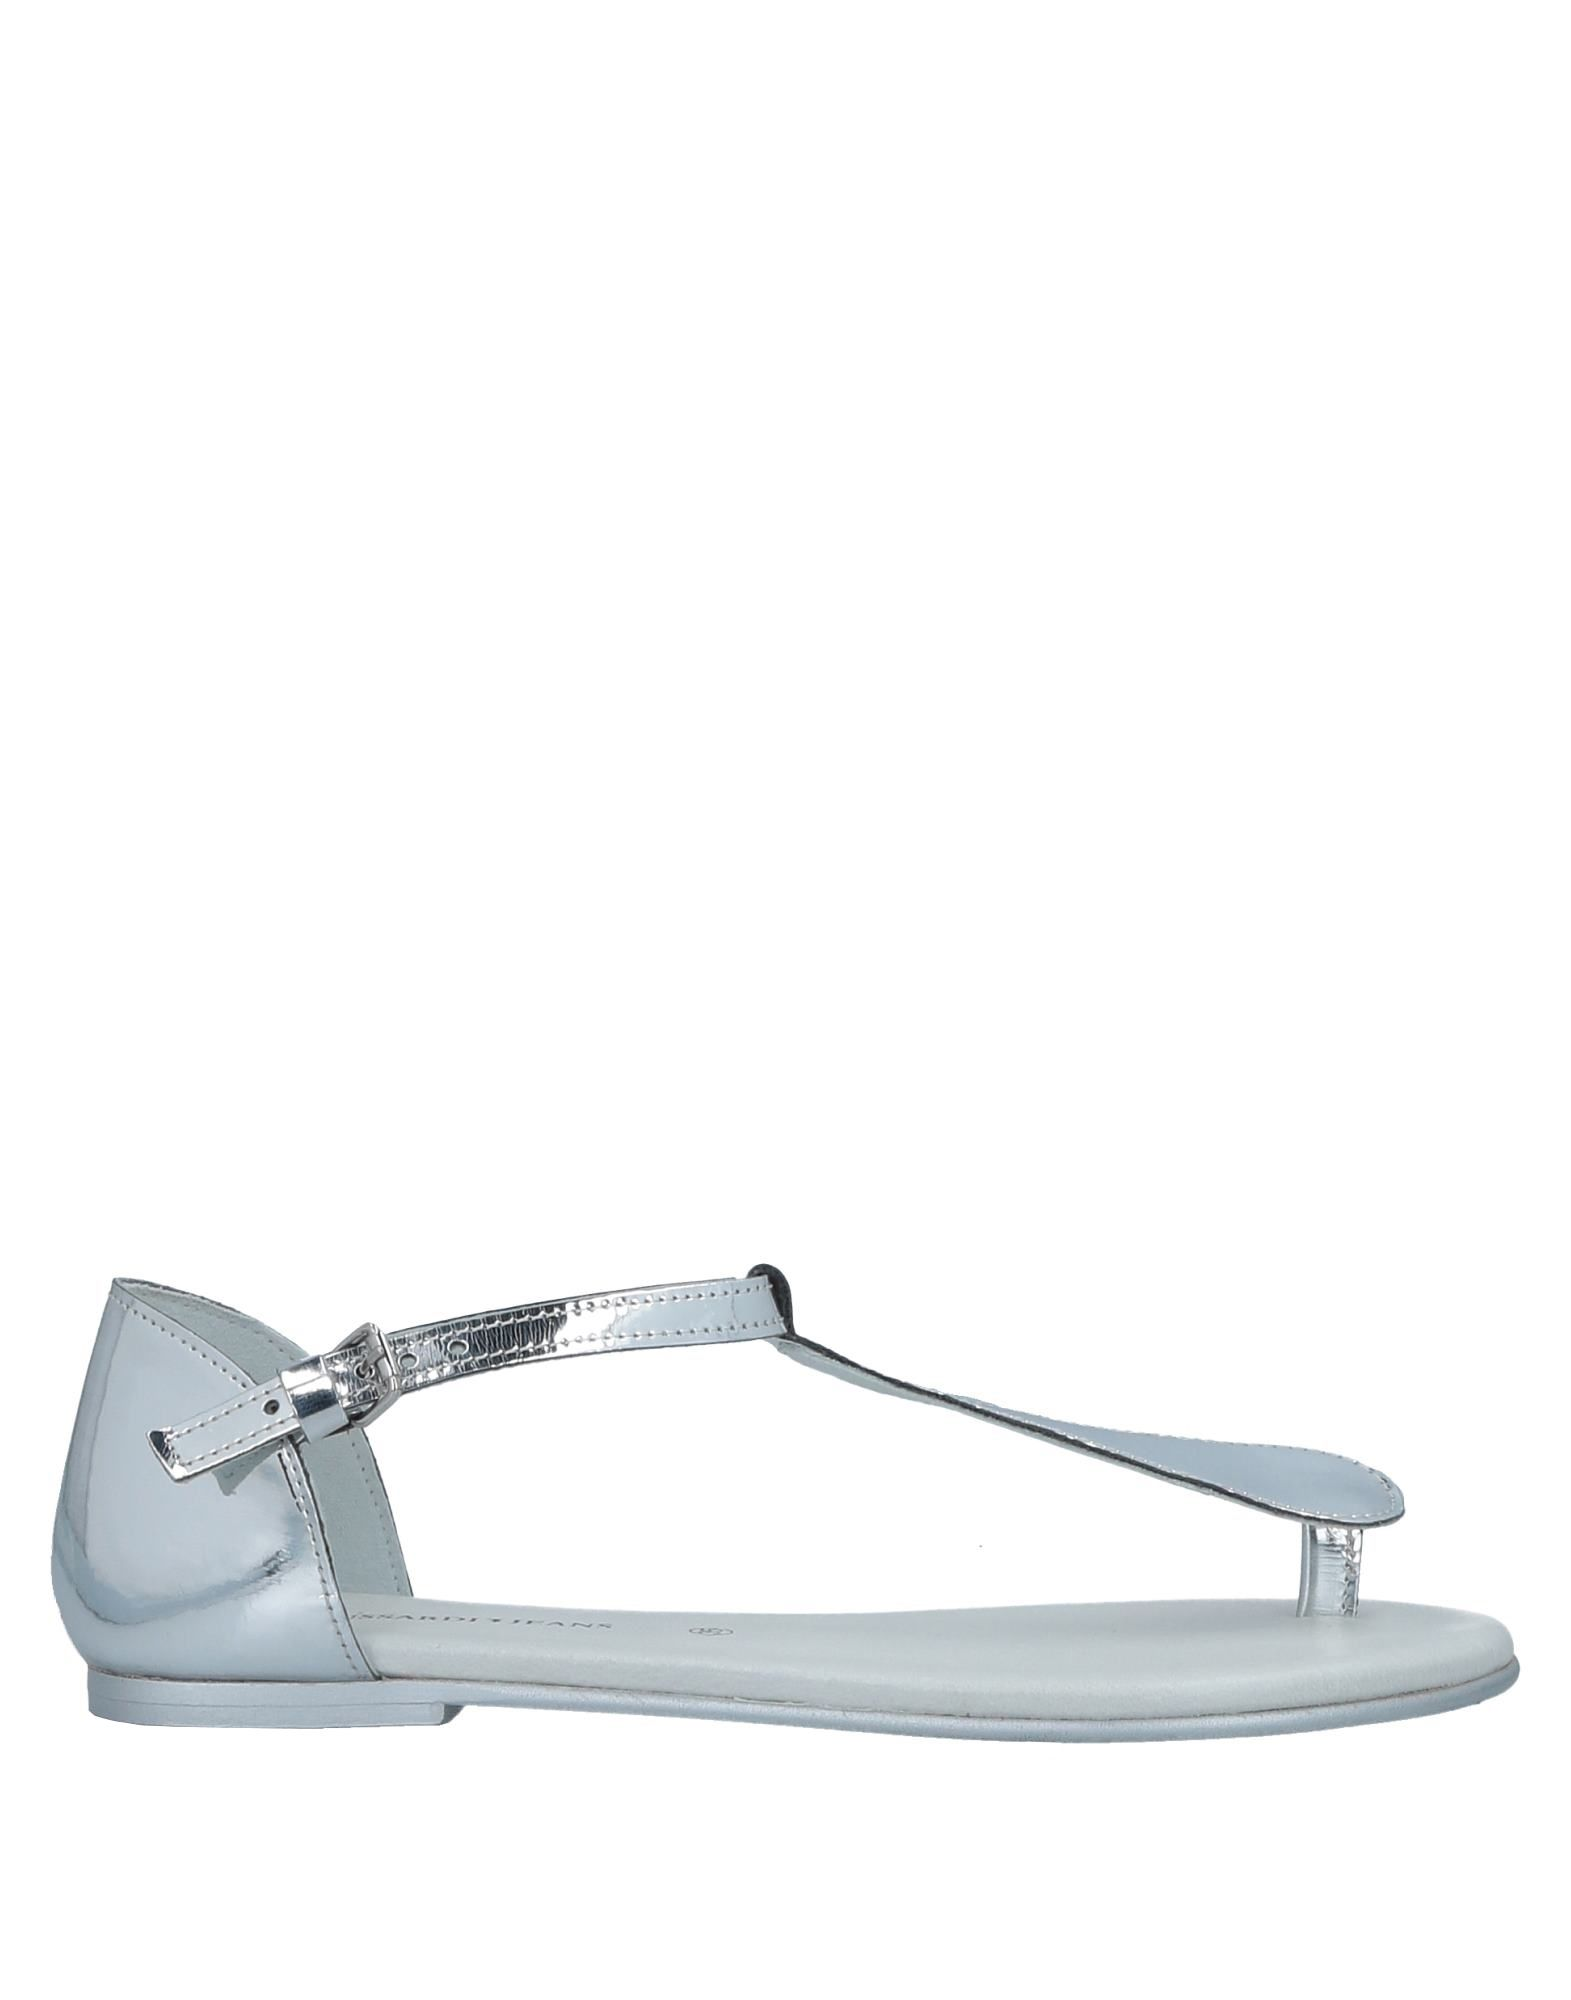 Trussardi Jeans Dianetten Damen  11515622PU Gute Qualität beliebte Schuhe